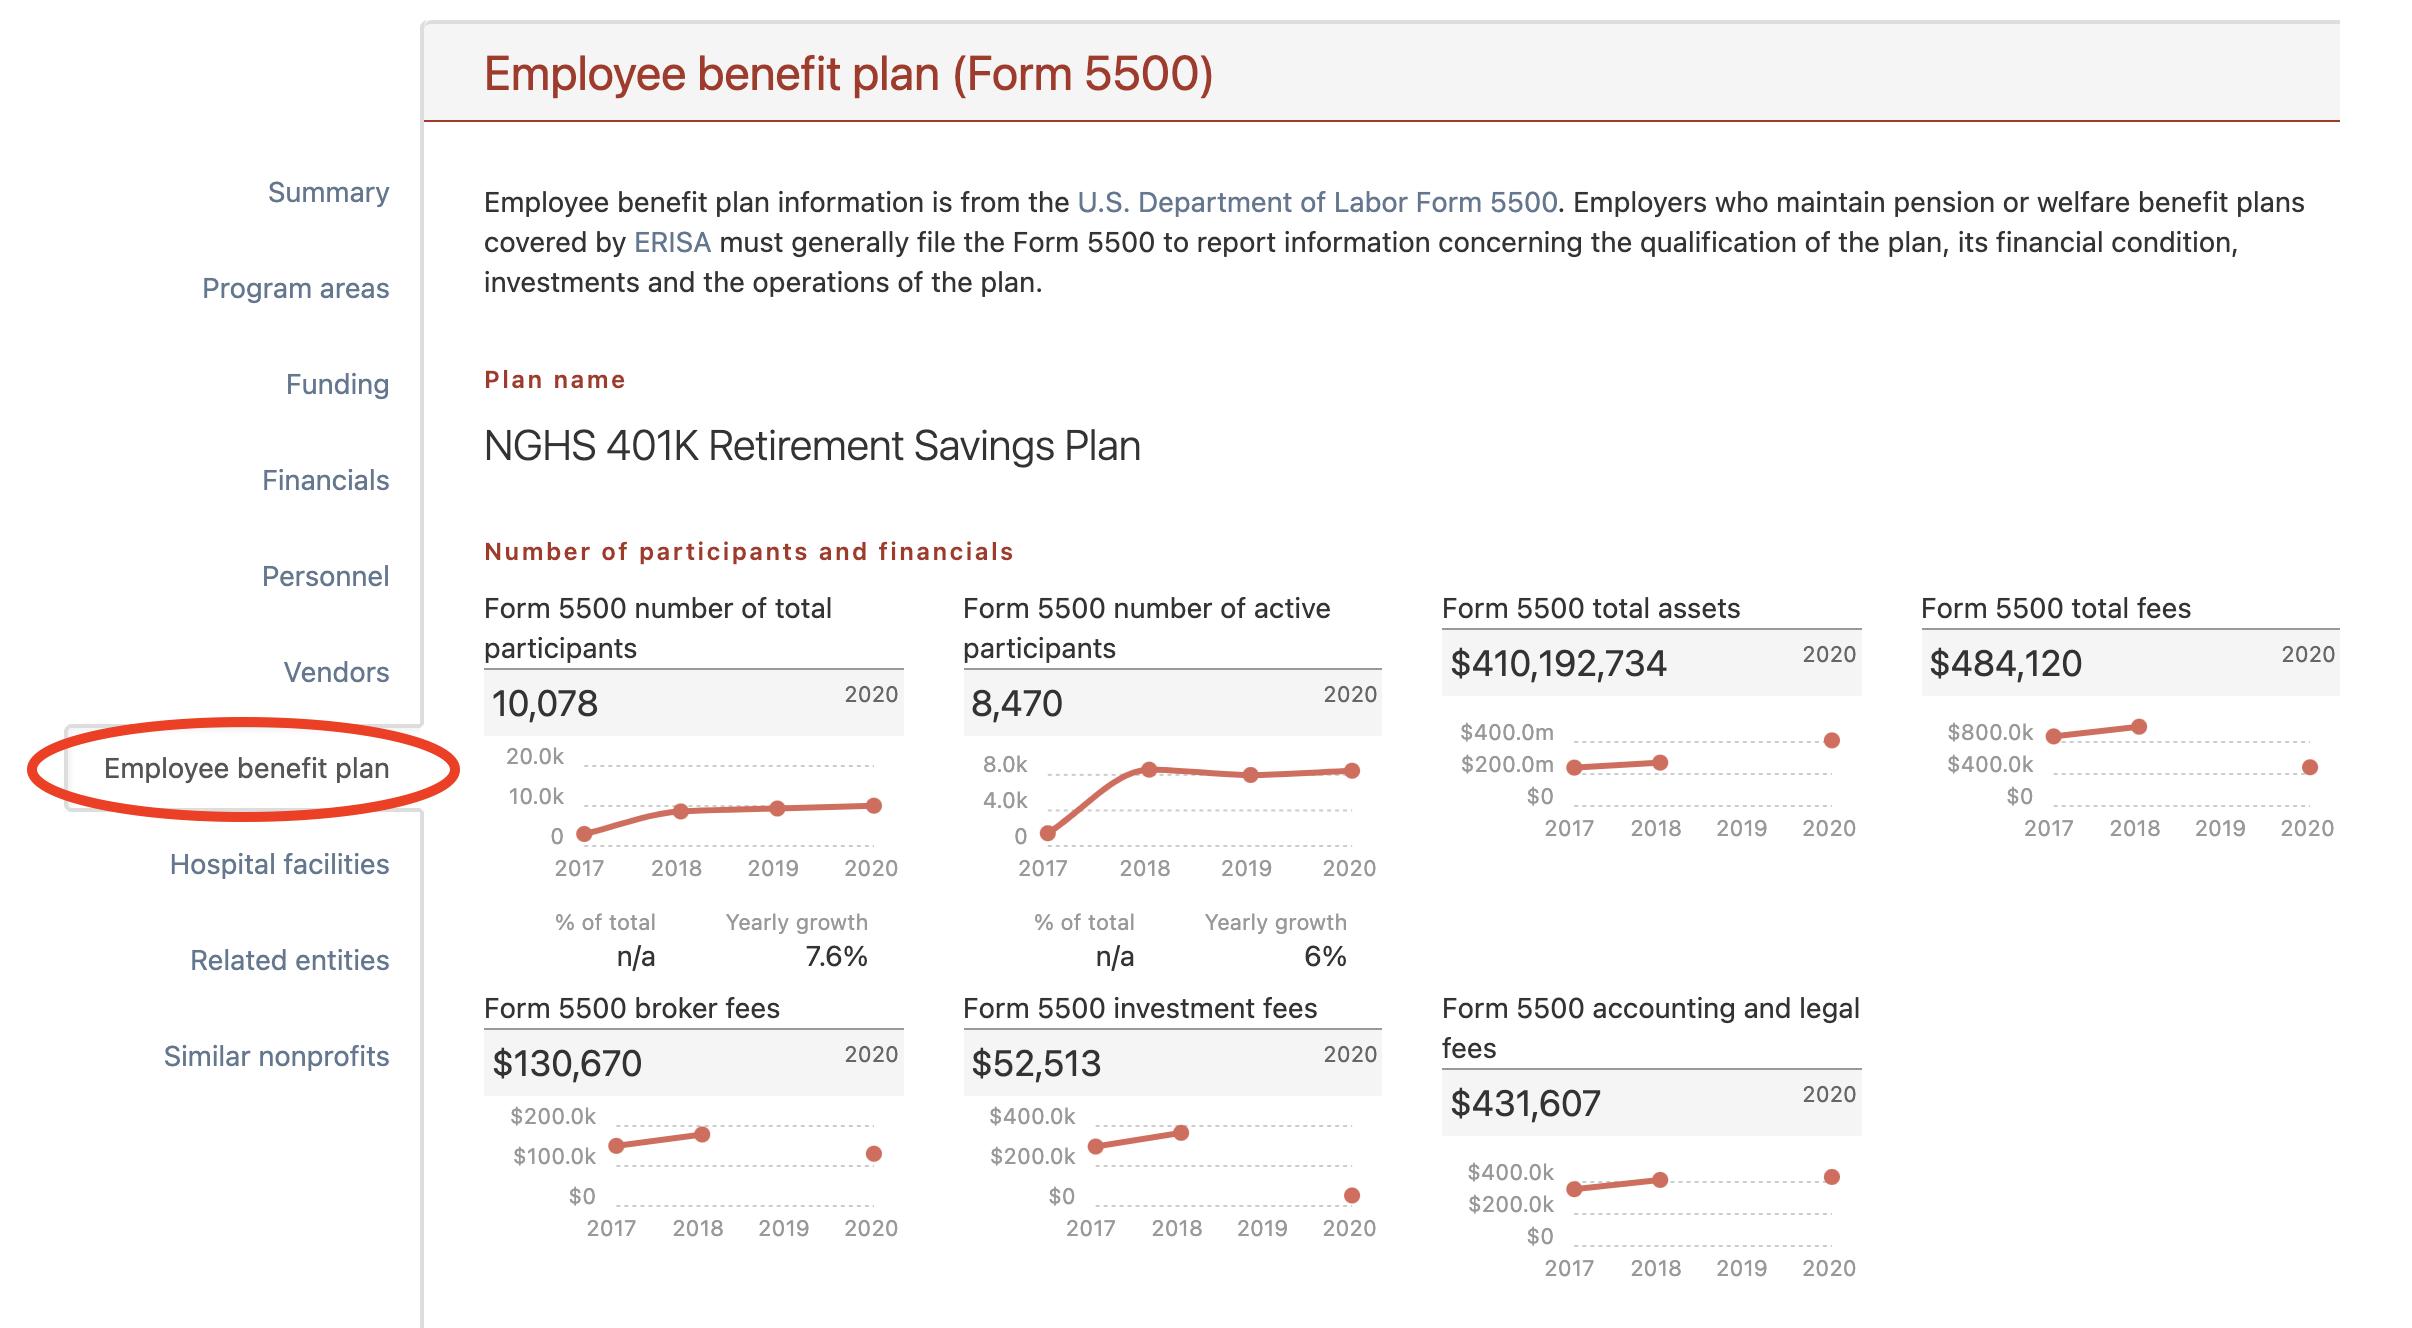 Employee benefit plan section on an organization's profile